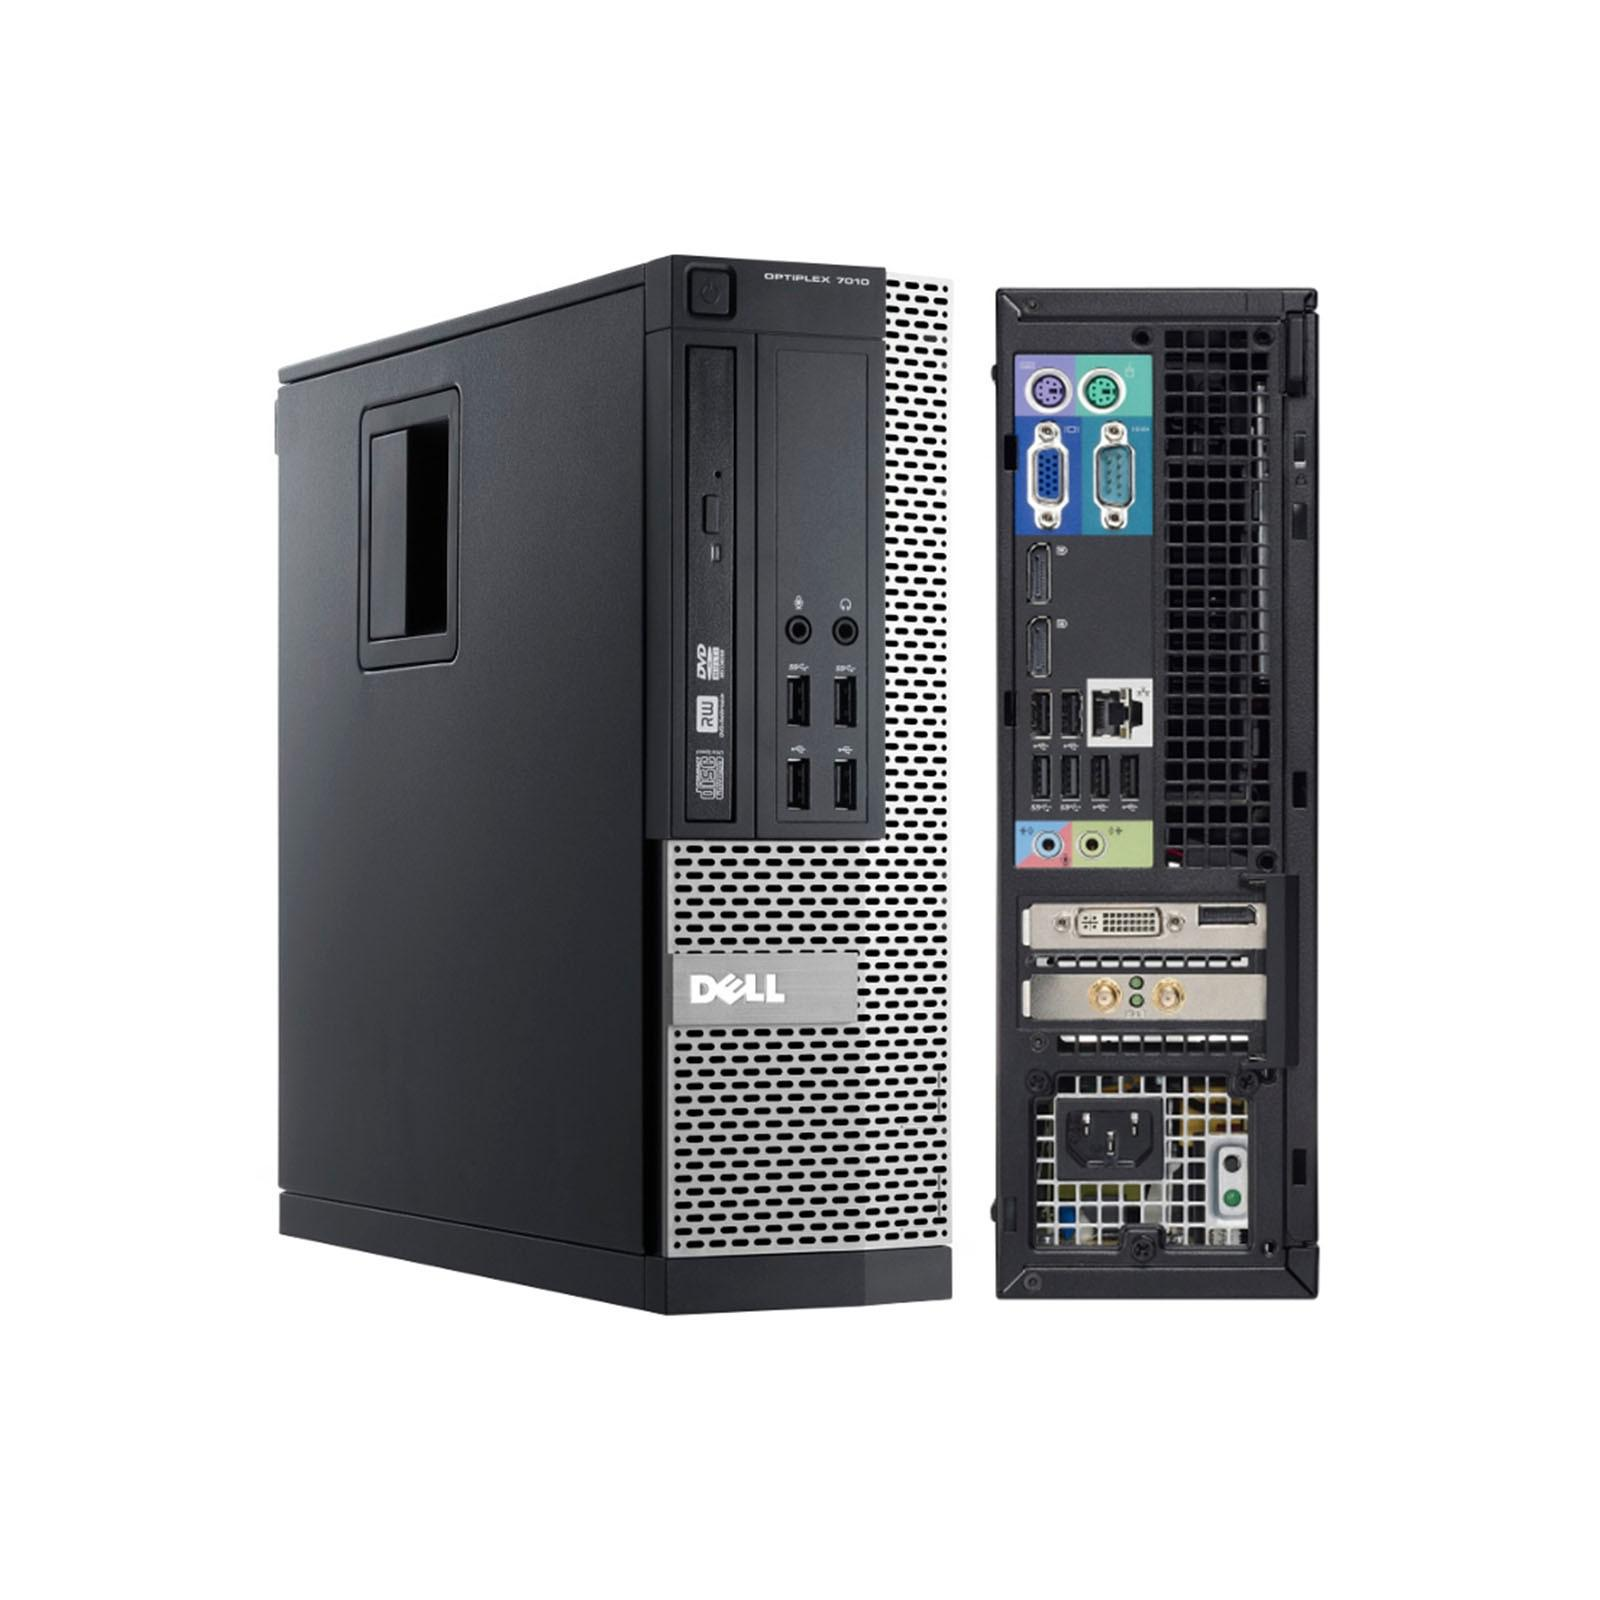 Dell Optiplex 7010 SFF Core I5 3,2 GHz - HDD 2 To RAM 4 Go